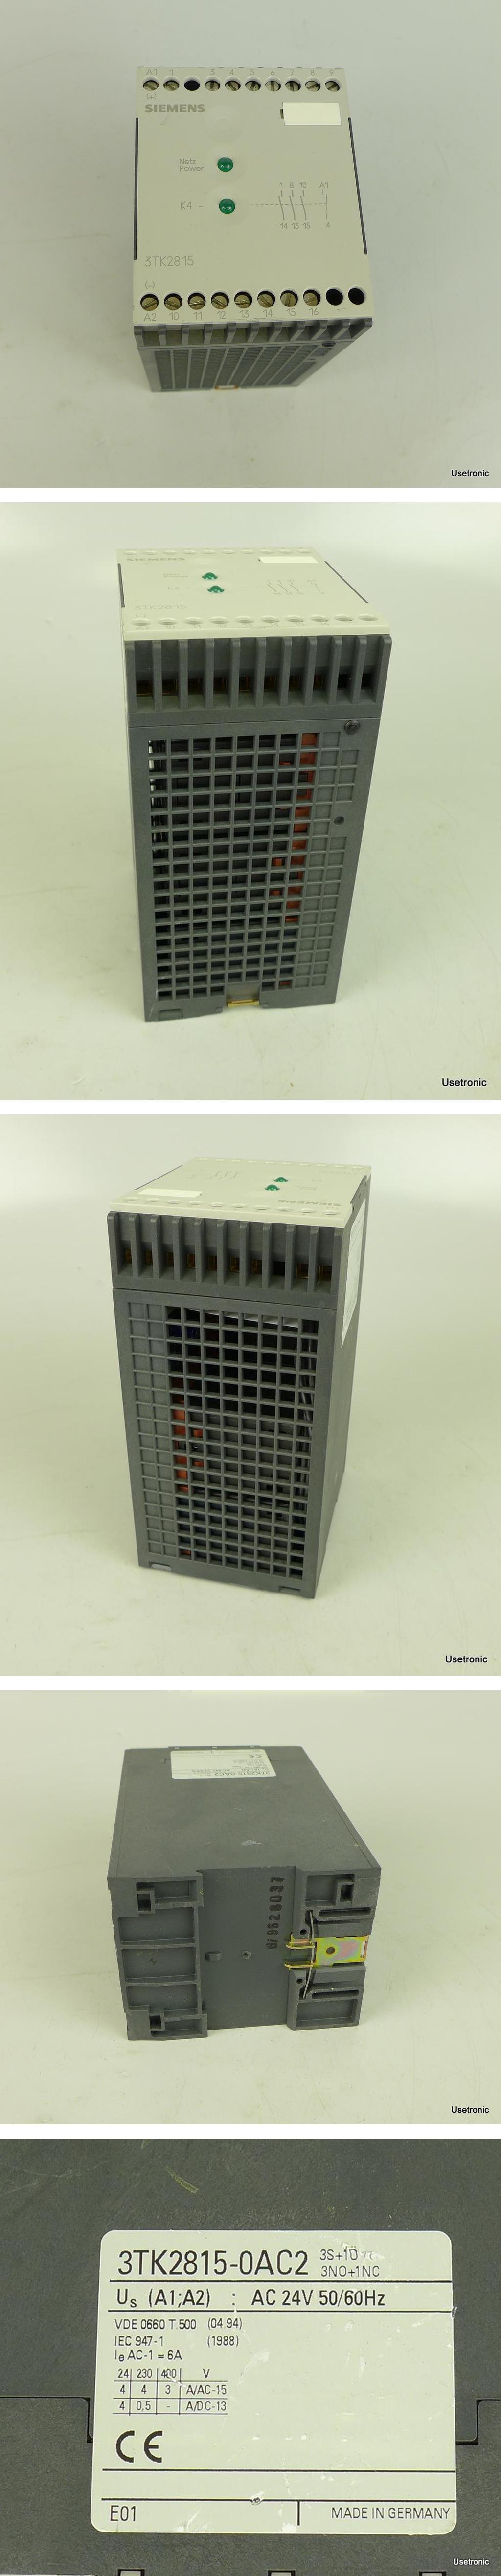 Siemens 3TK2815-0AC2